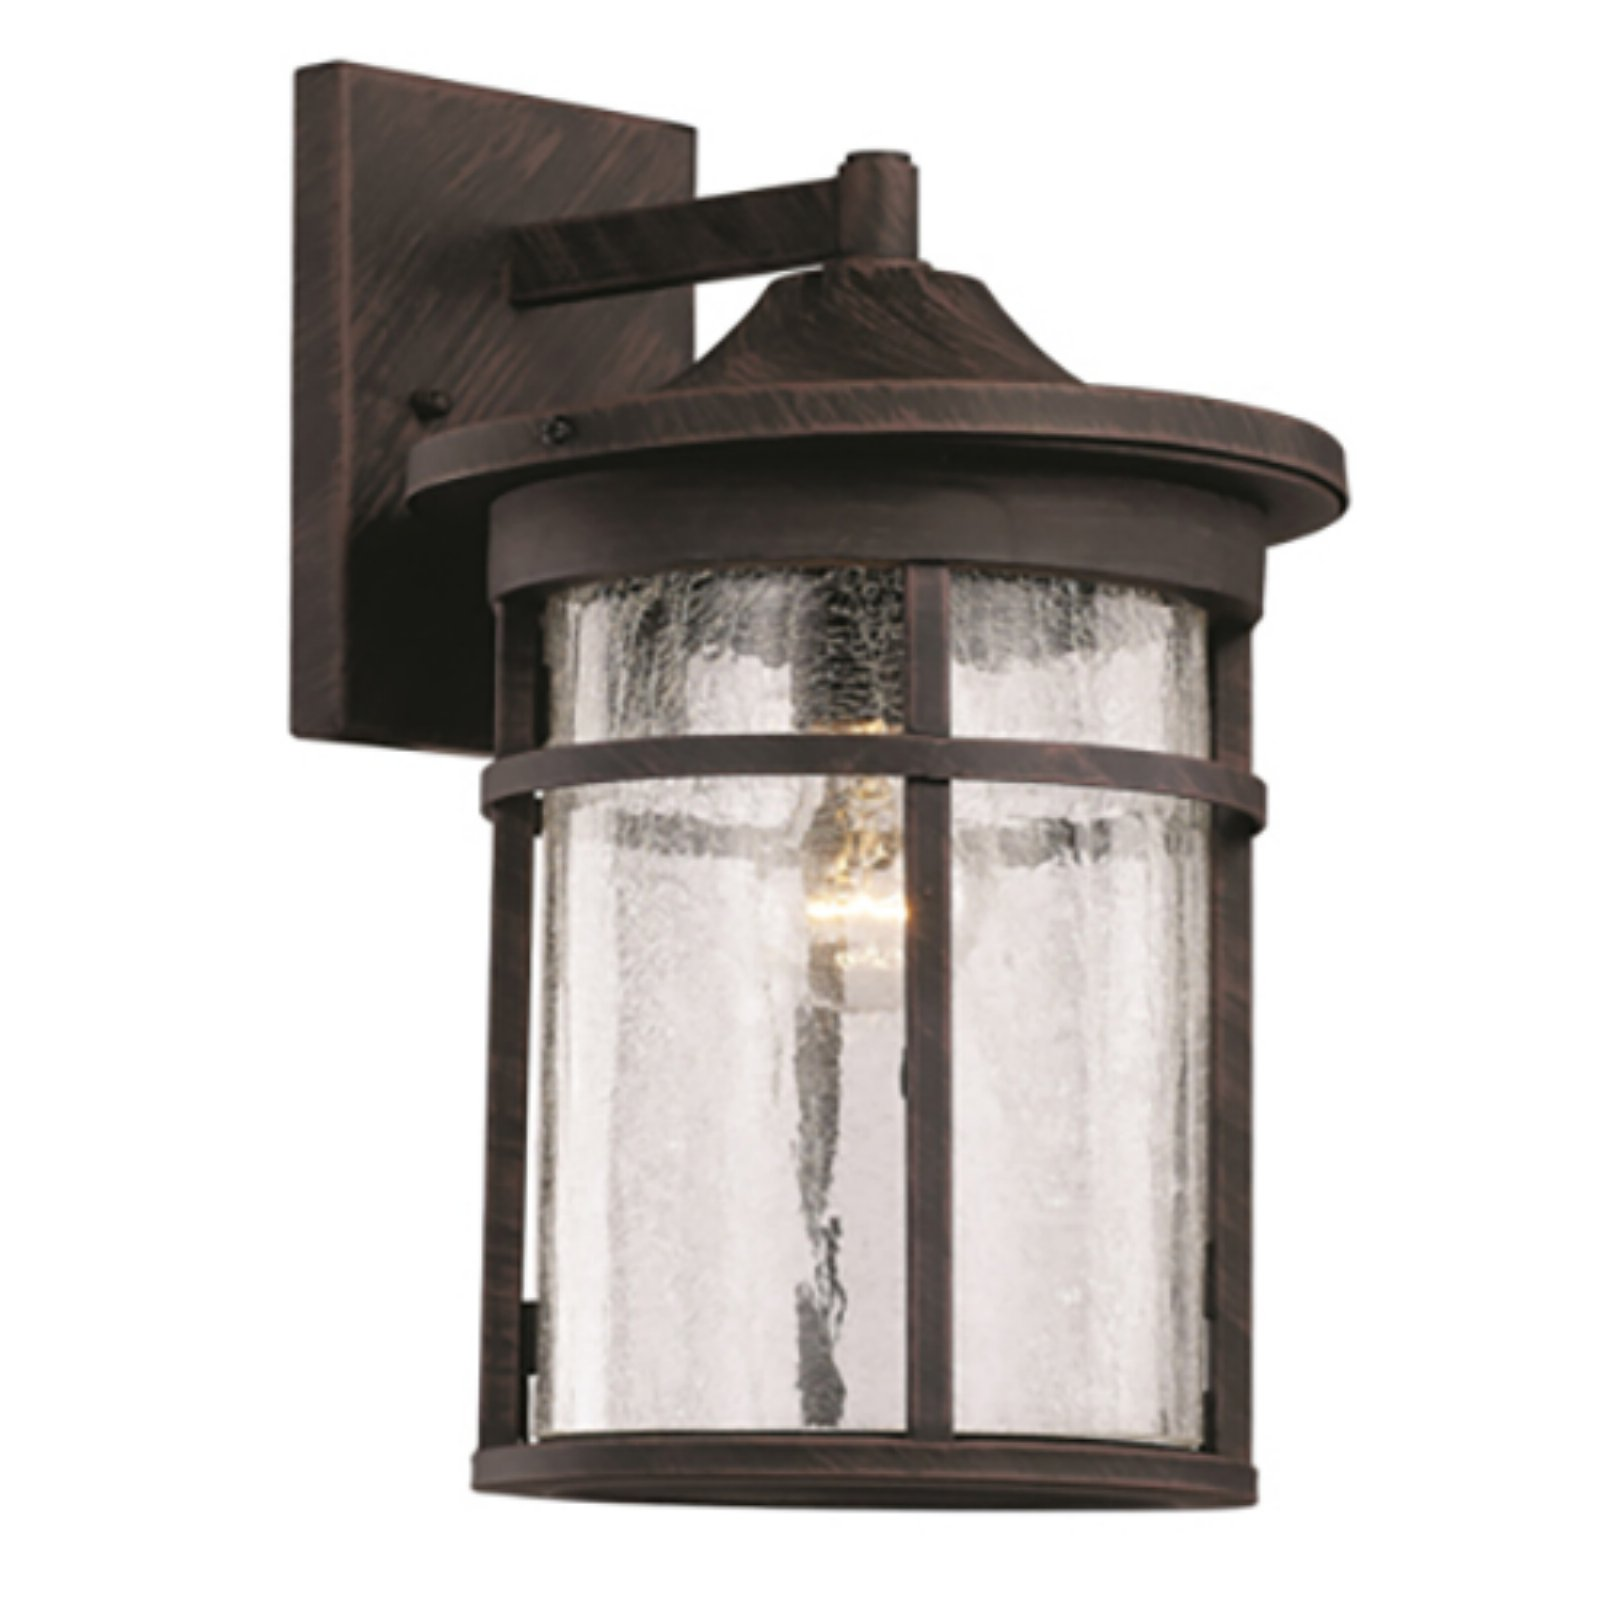 Trans Globe Lighting Avalon 4038 Outdoor Wall Lantern